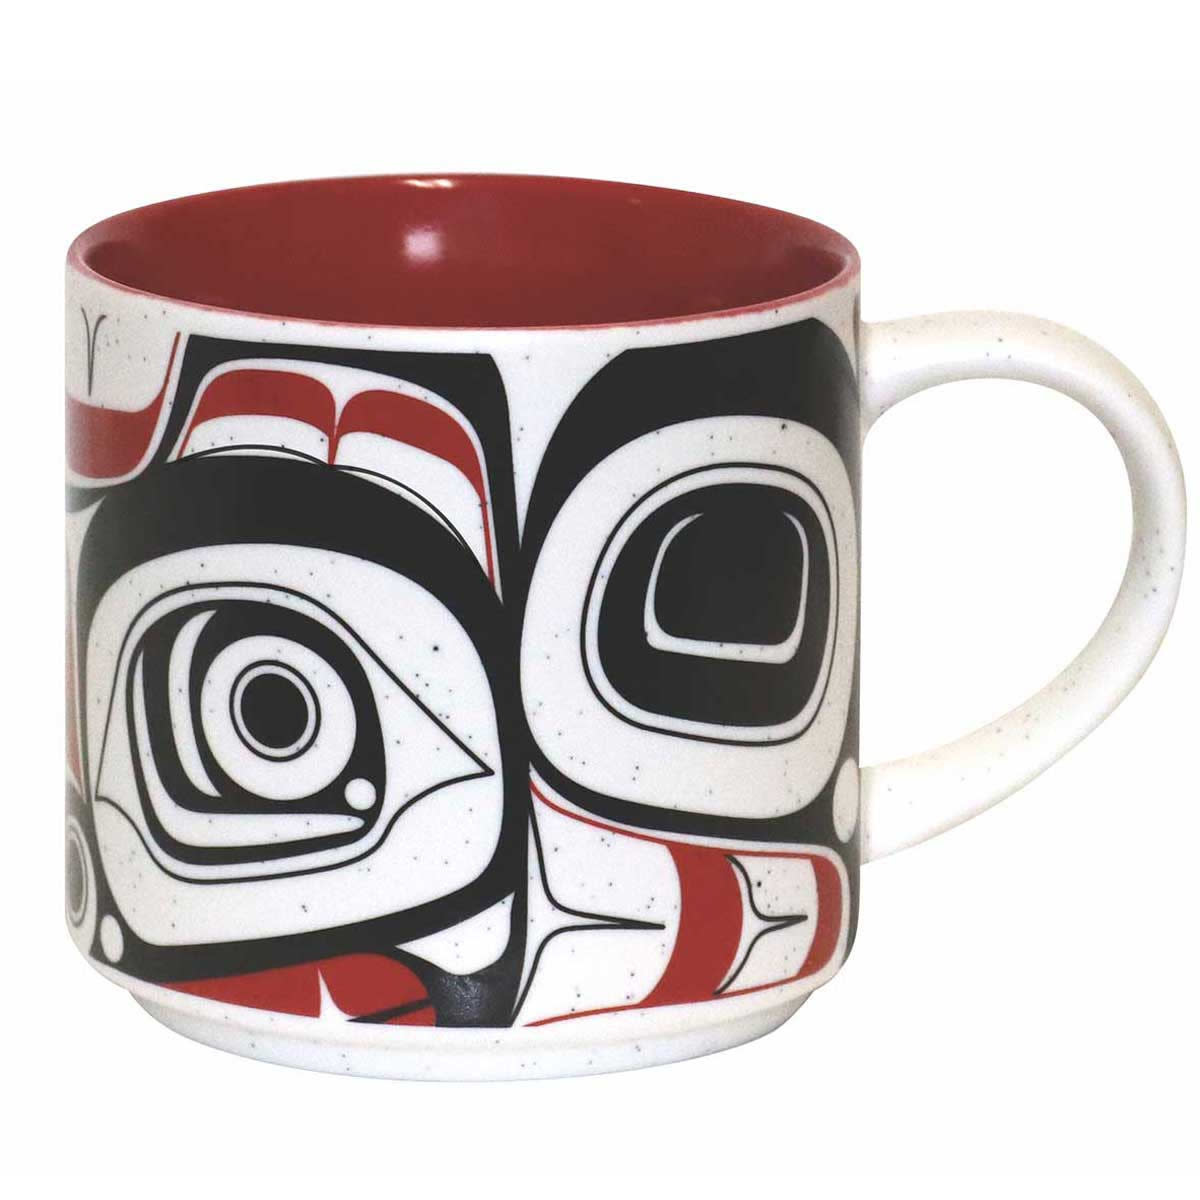 16 oz Ceramic Mug-8